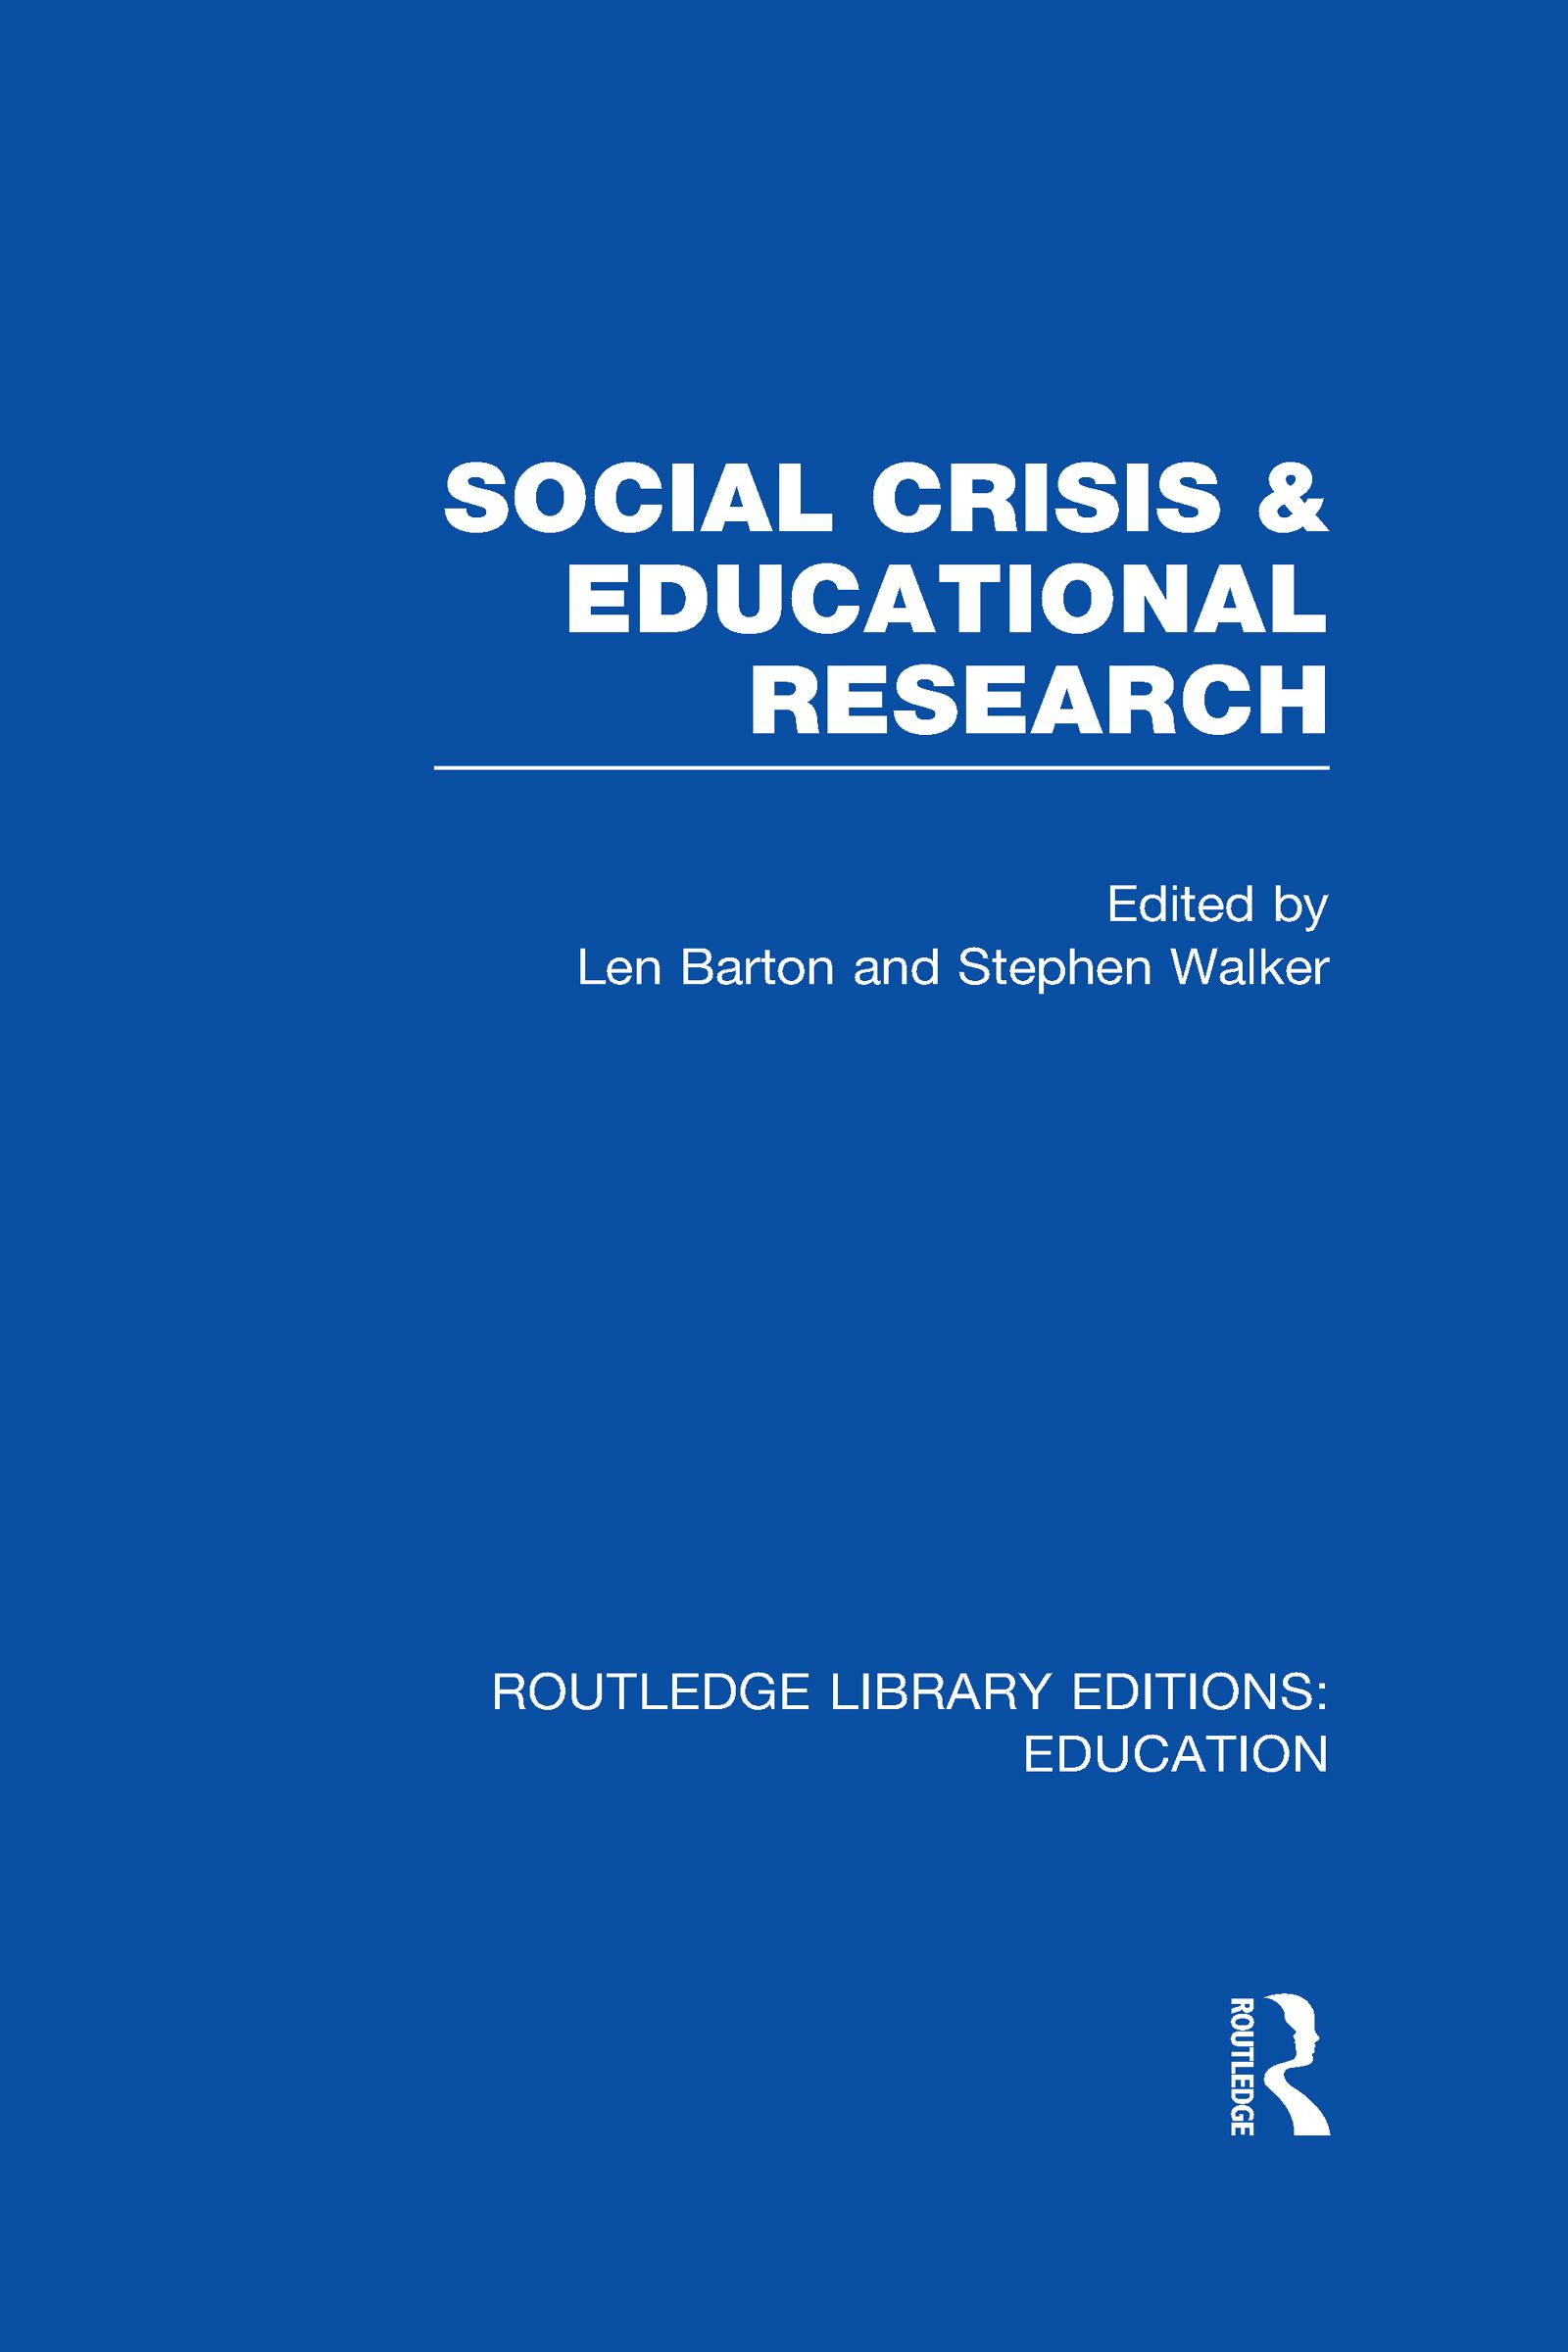 Social Crisis and Educational Research (RLE Edu L) (Hardback) book cover